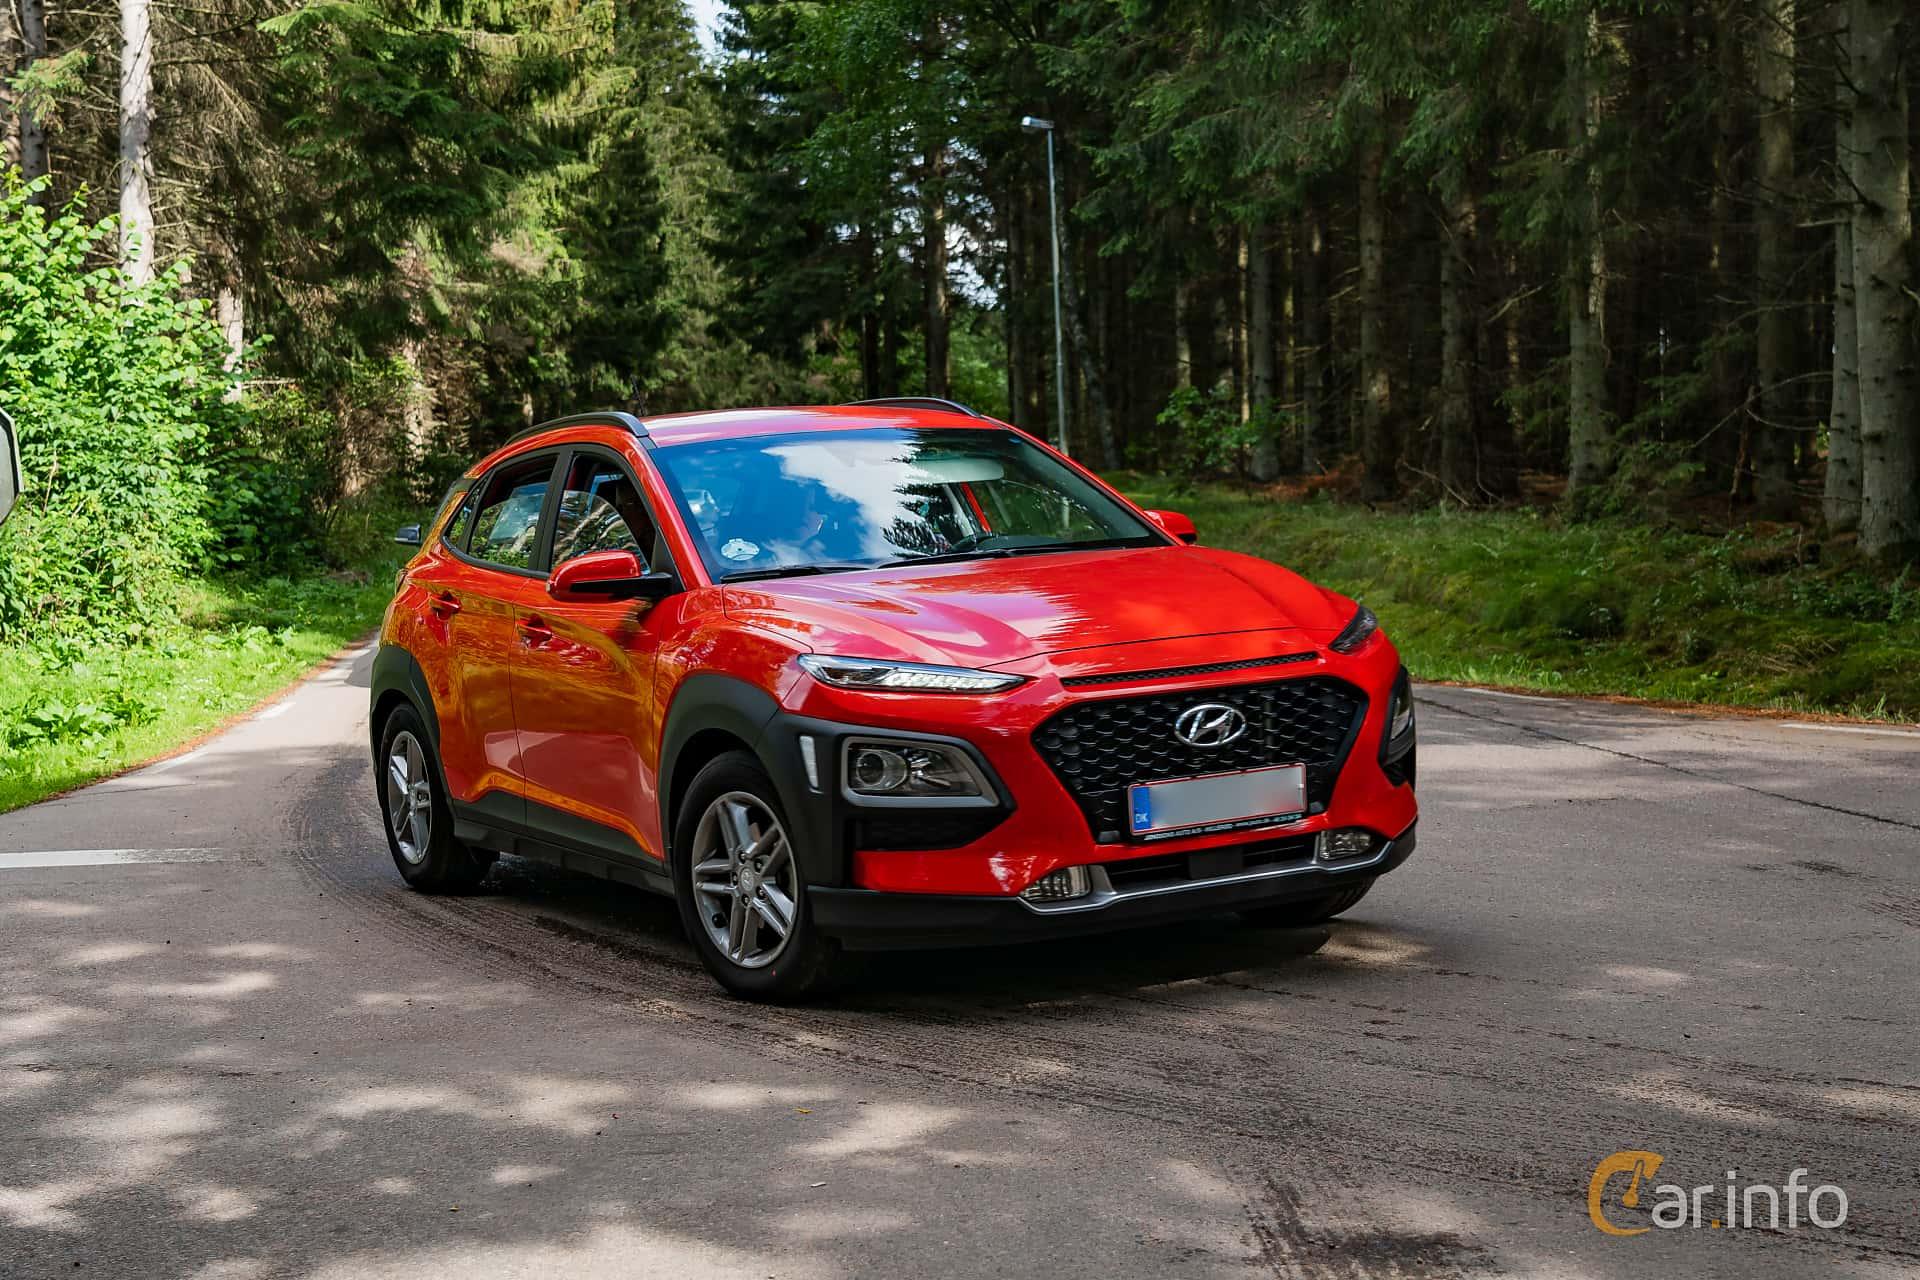 Hyundai Kona 1.0 T-GDI blue Manual, 120hp, 2018 at Svenskt sportvagnsmeeting 2019